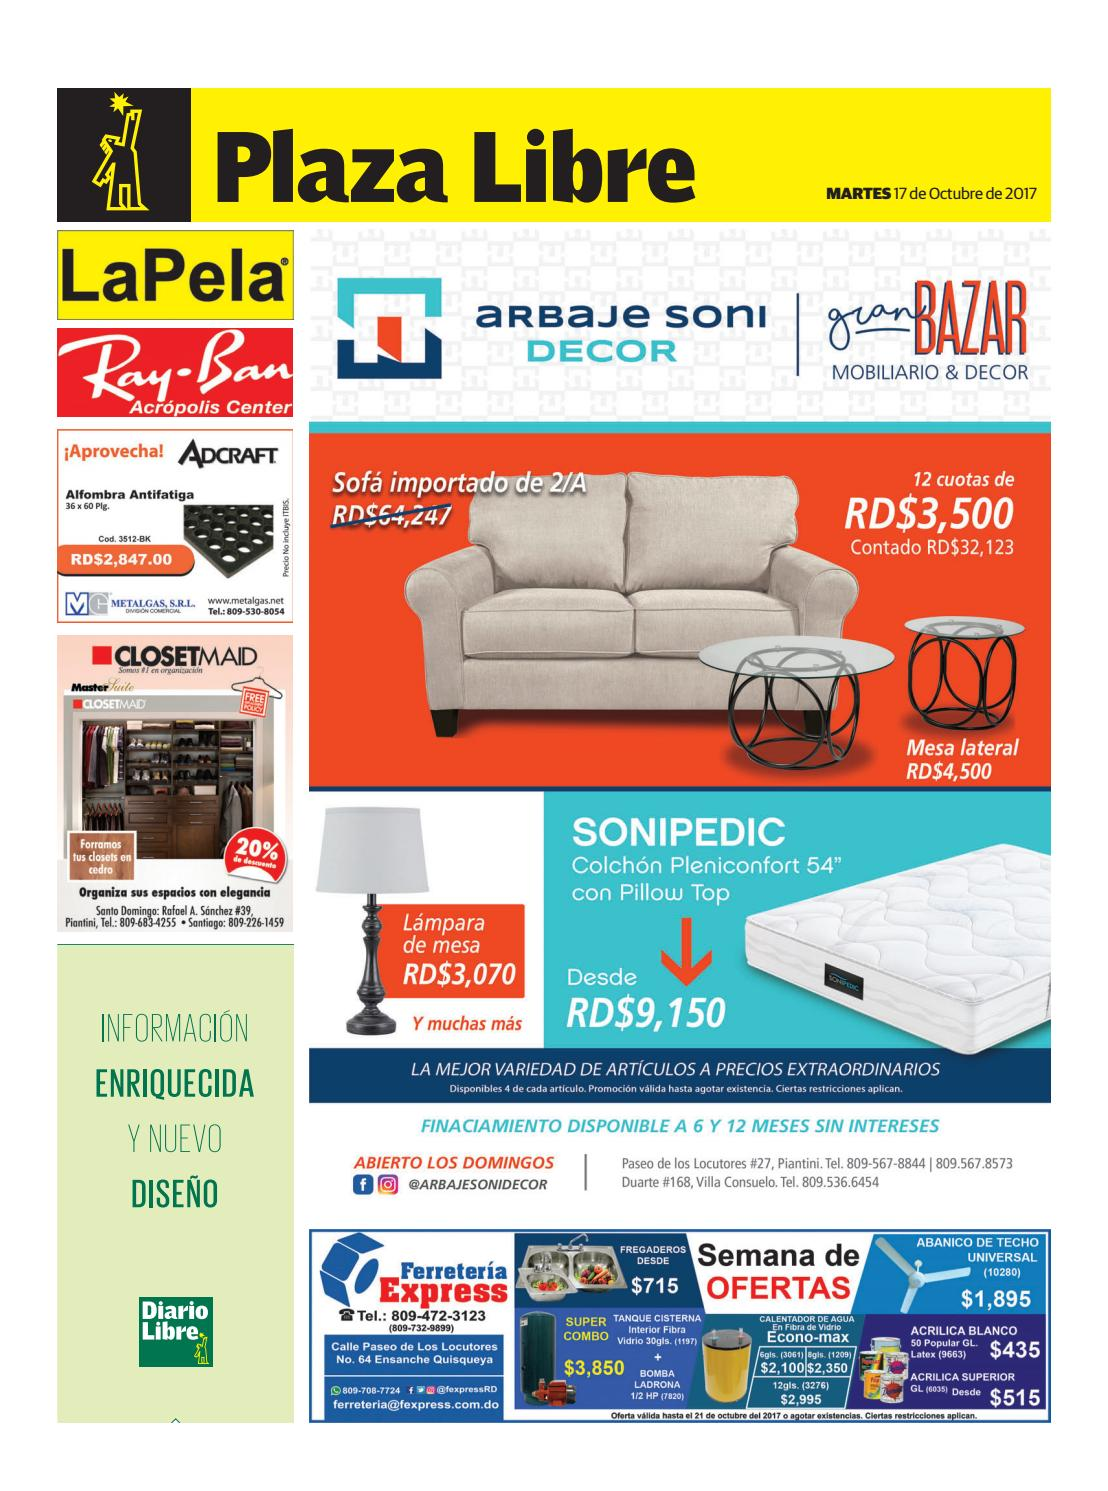 Carte Accord D Economax.Pl20171017 By Diario Libre Issuu